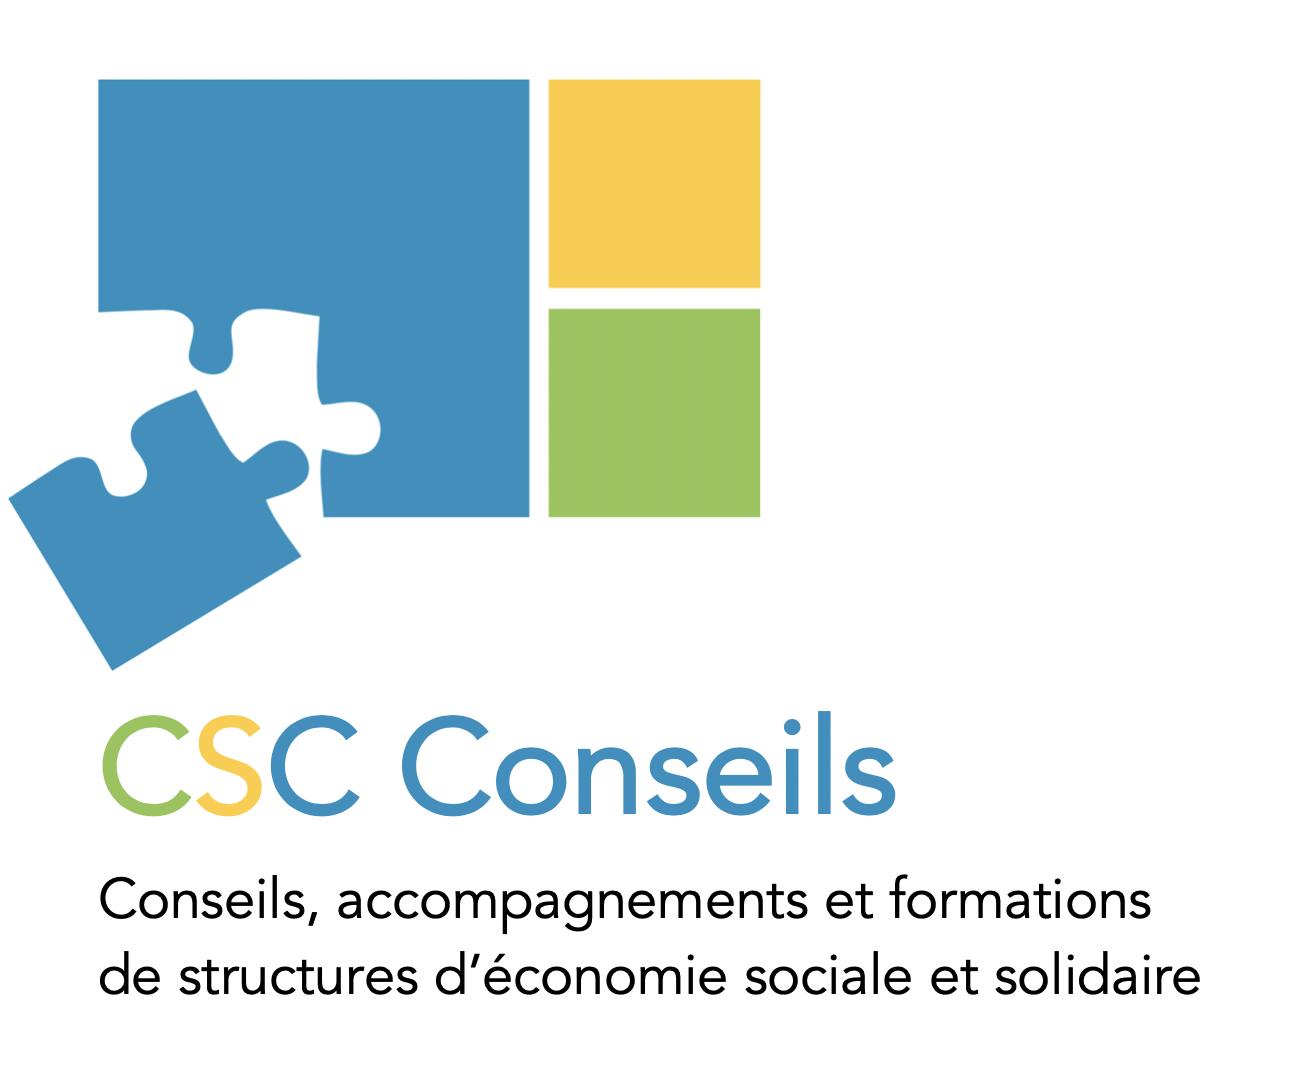 CSC Conseils